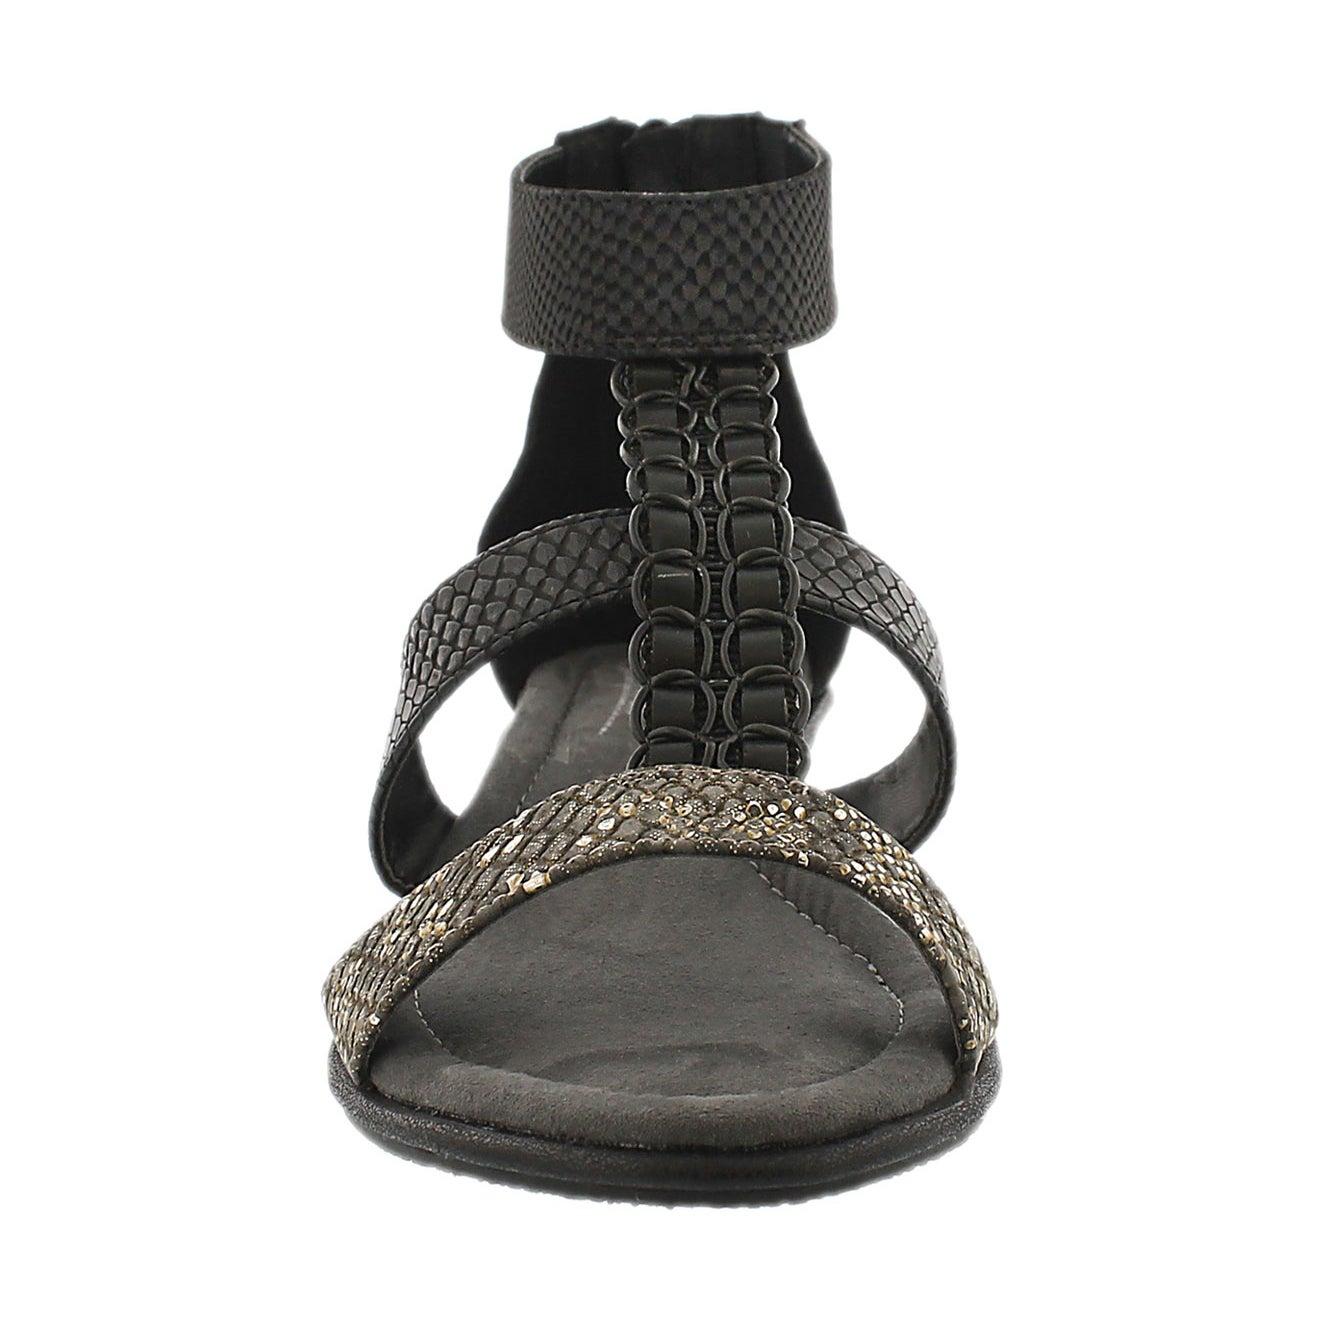 Lds Bjork blk wdg t-strap sandal